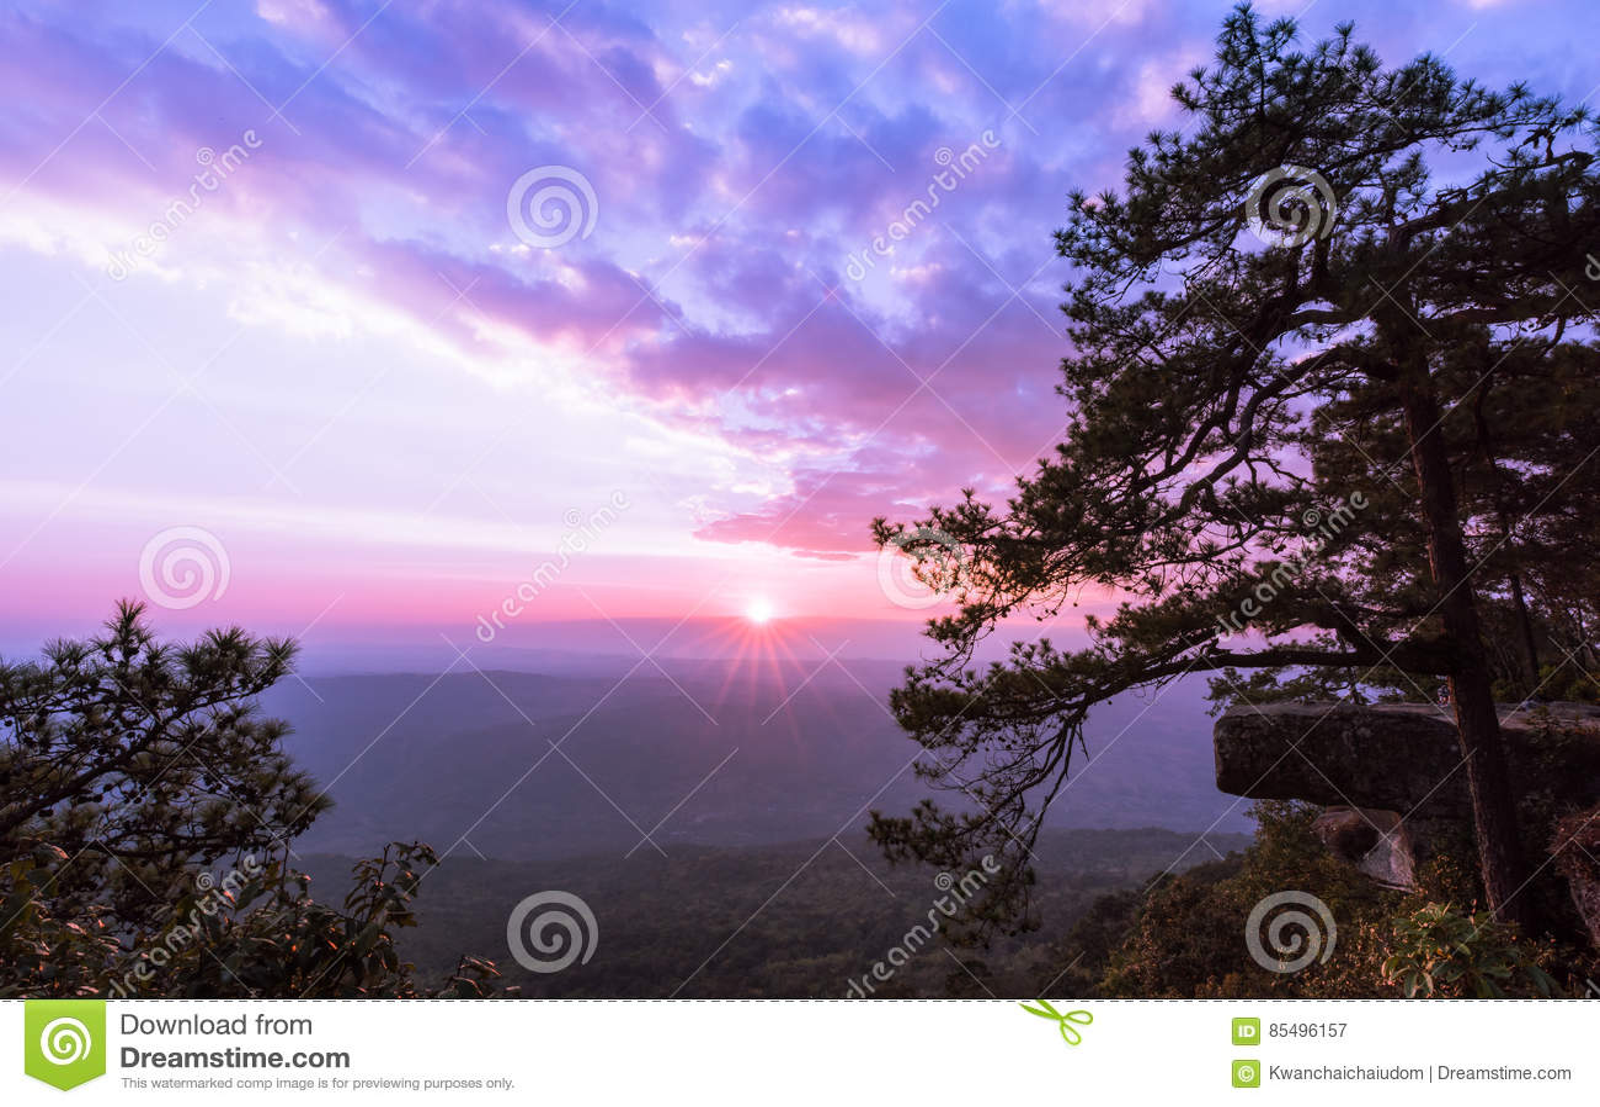 Mooie zonsondergang bij Lom Sak-klip, het Nationale Park van Phu Kradung